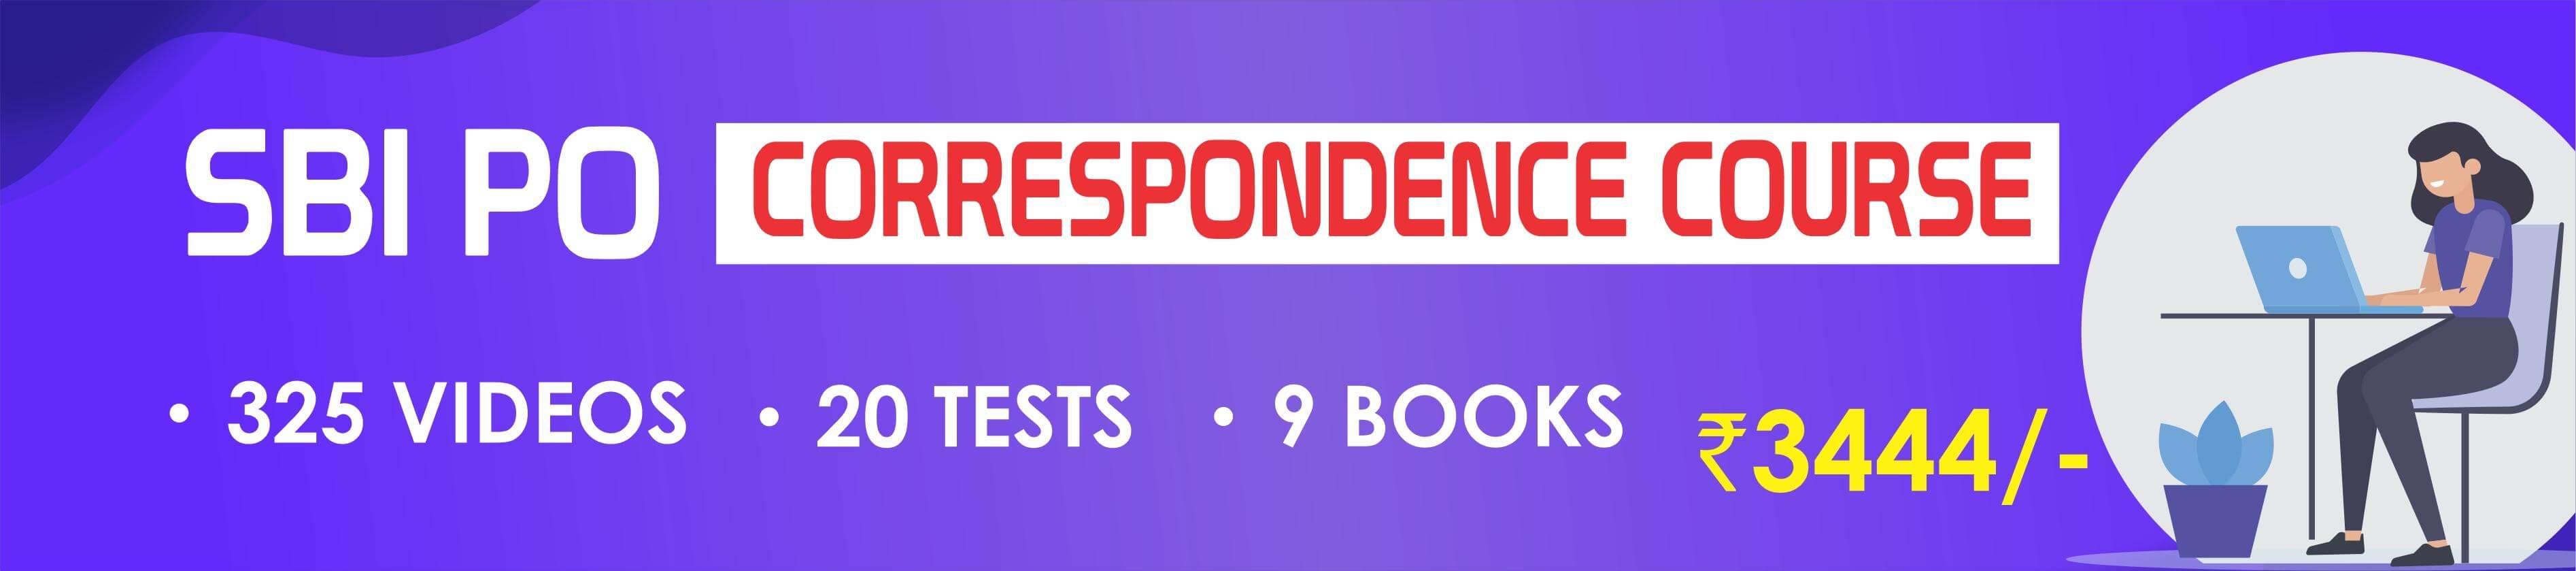 SBI PO Correspondance Course